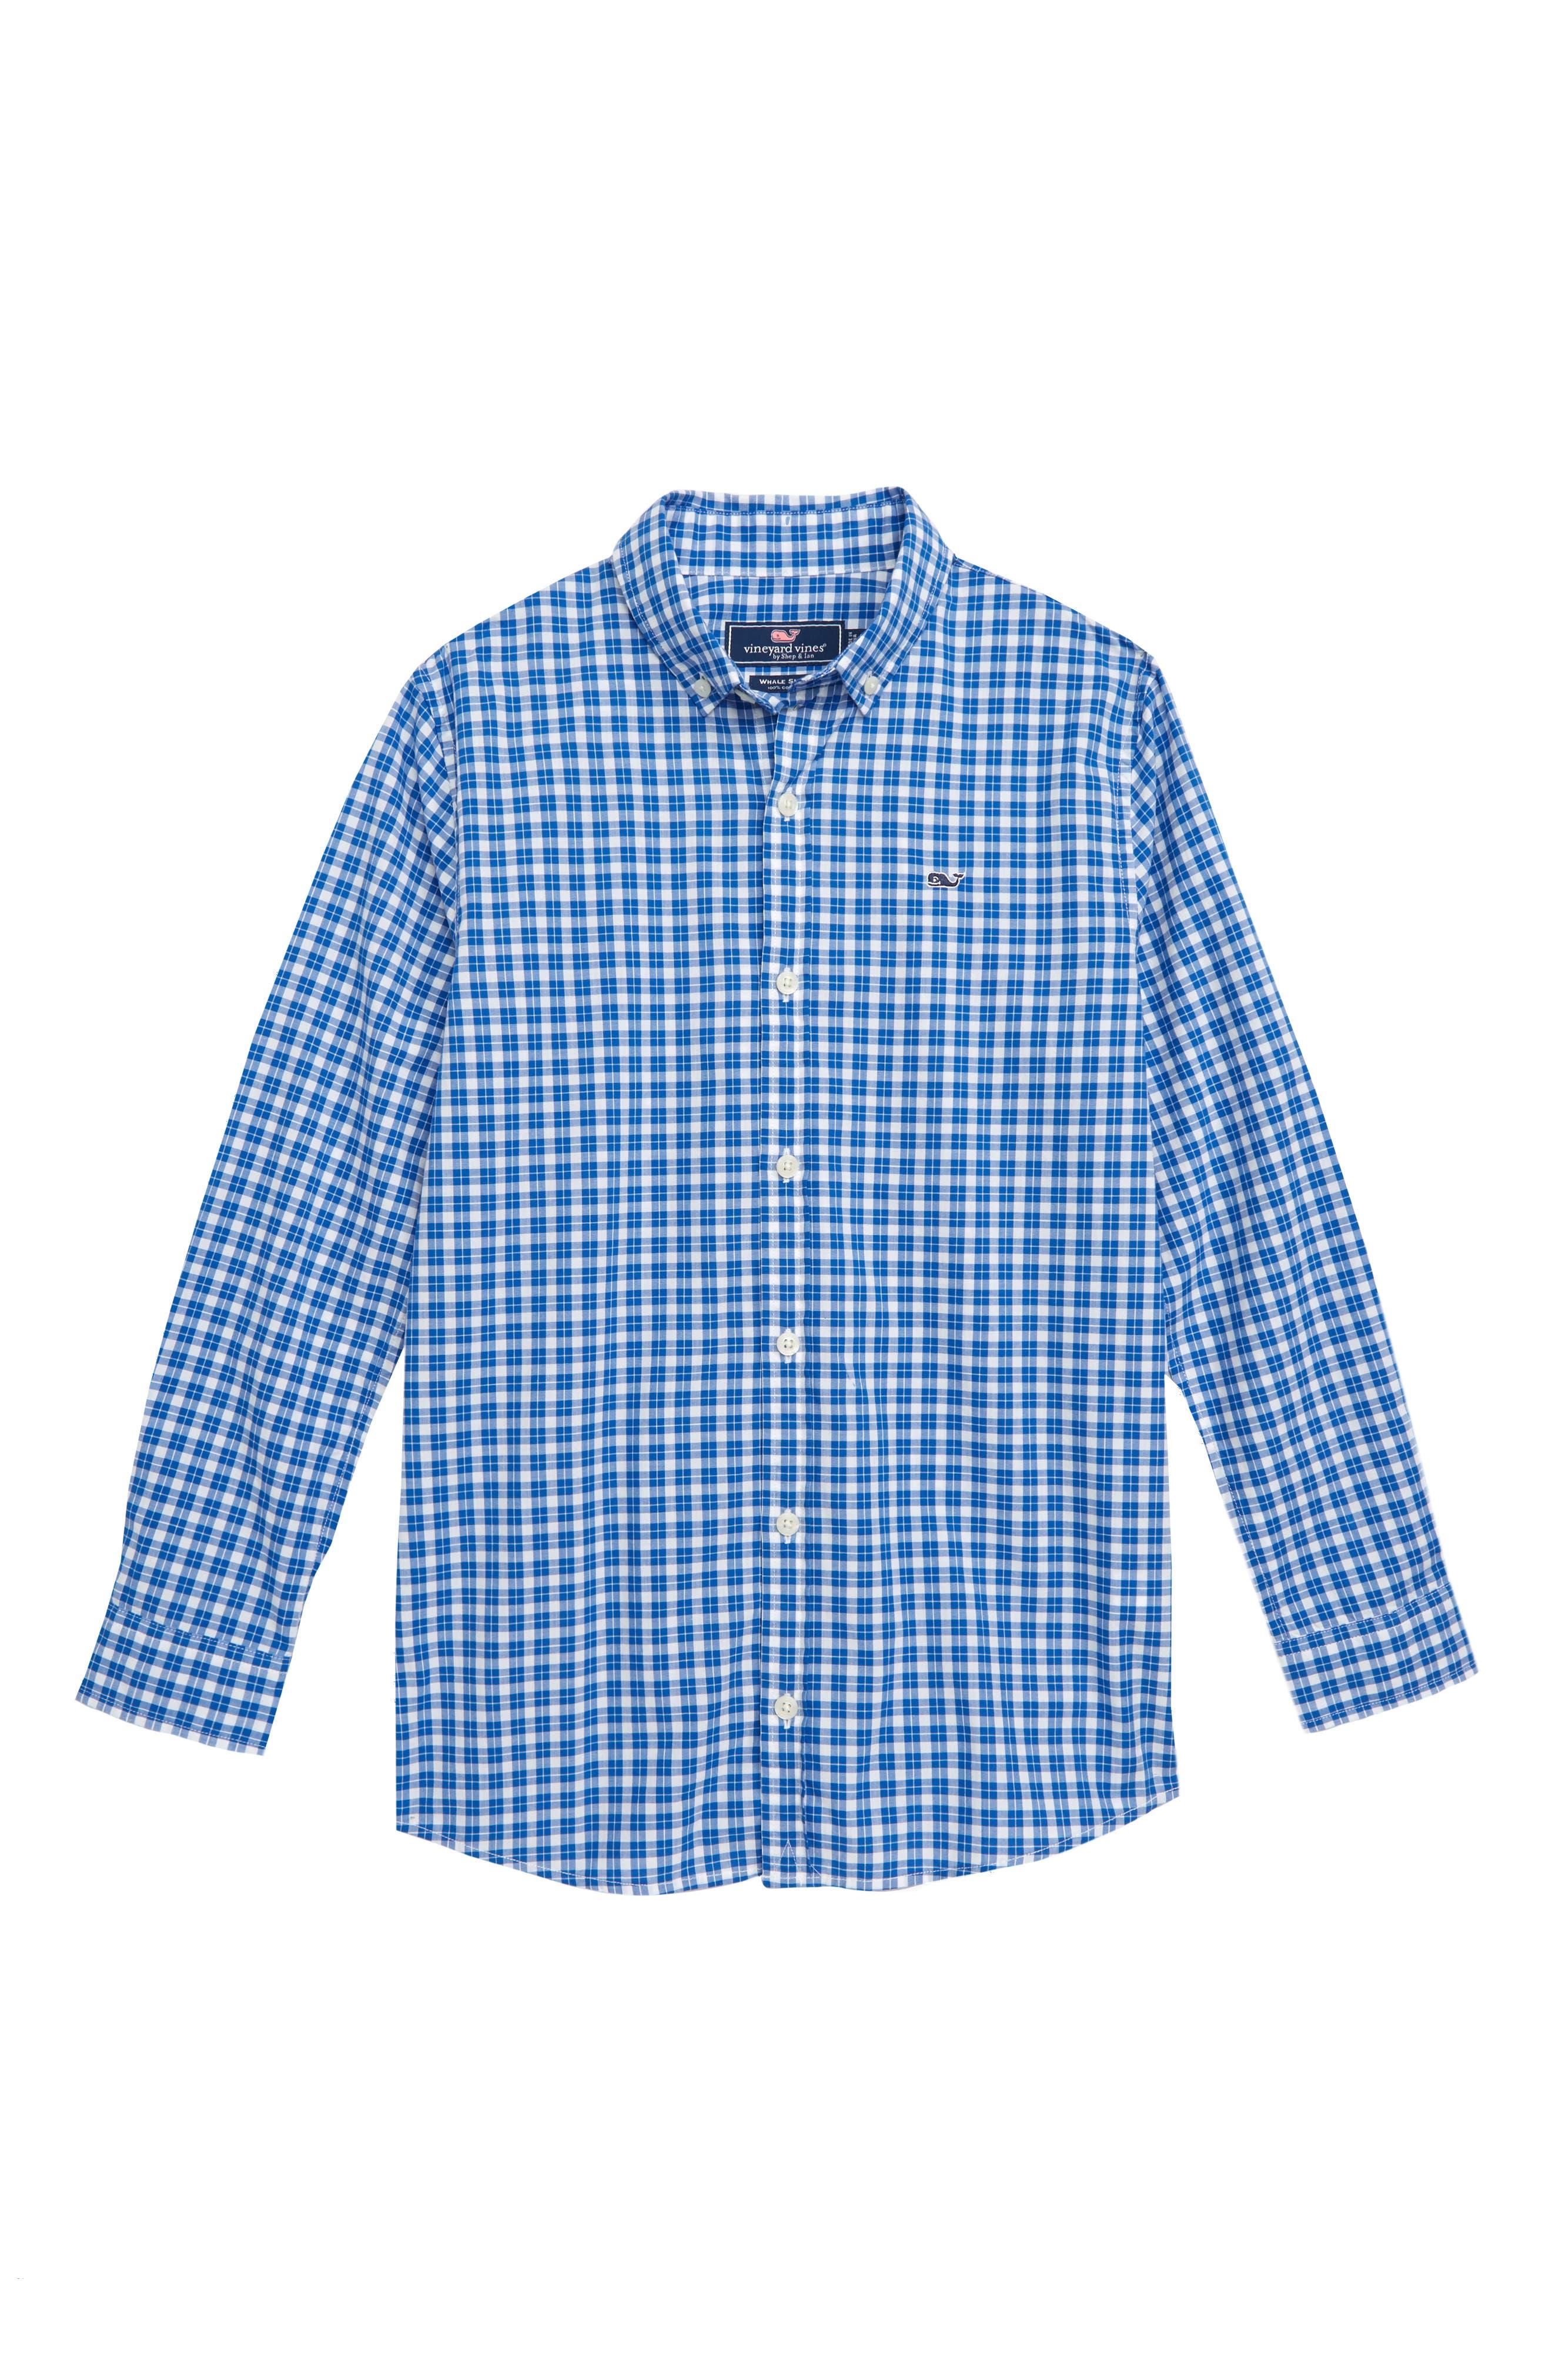 Eagle Hill Poplin Whale Shirt,                         Main,                         color, YACHT BLUE